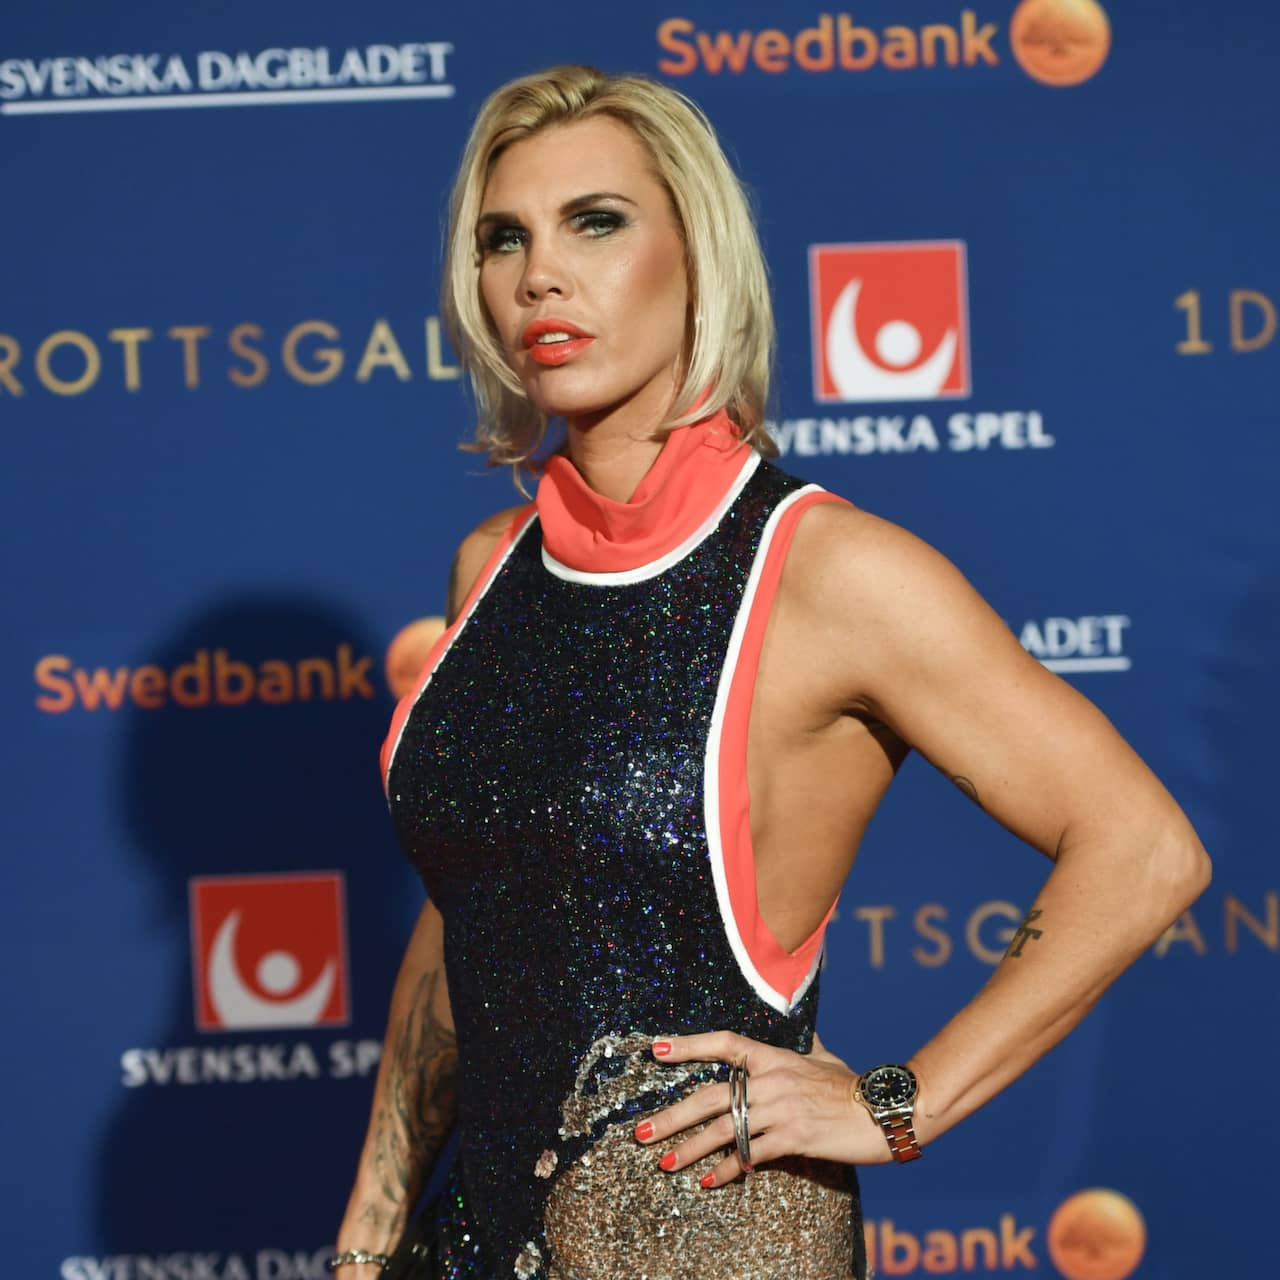 59. Mikaela Laurén